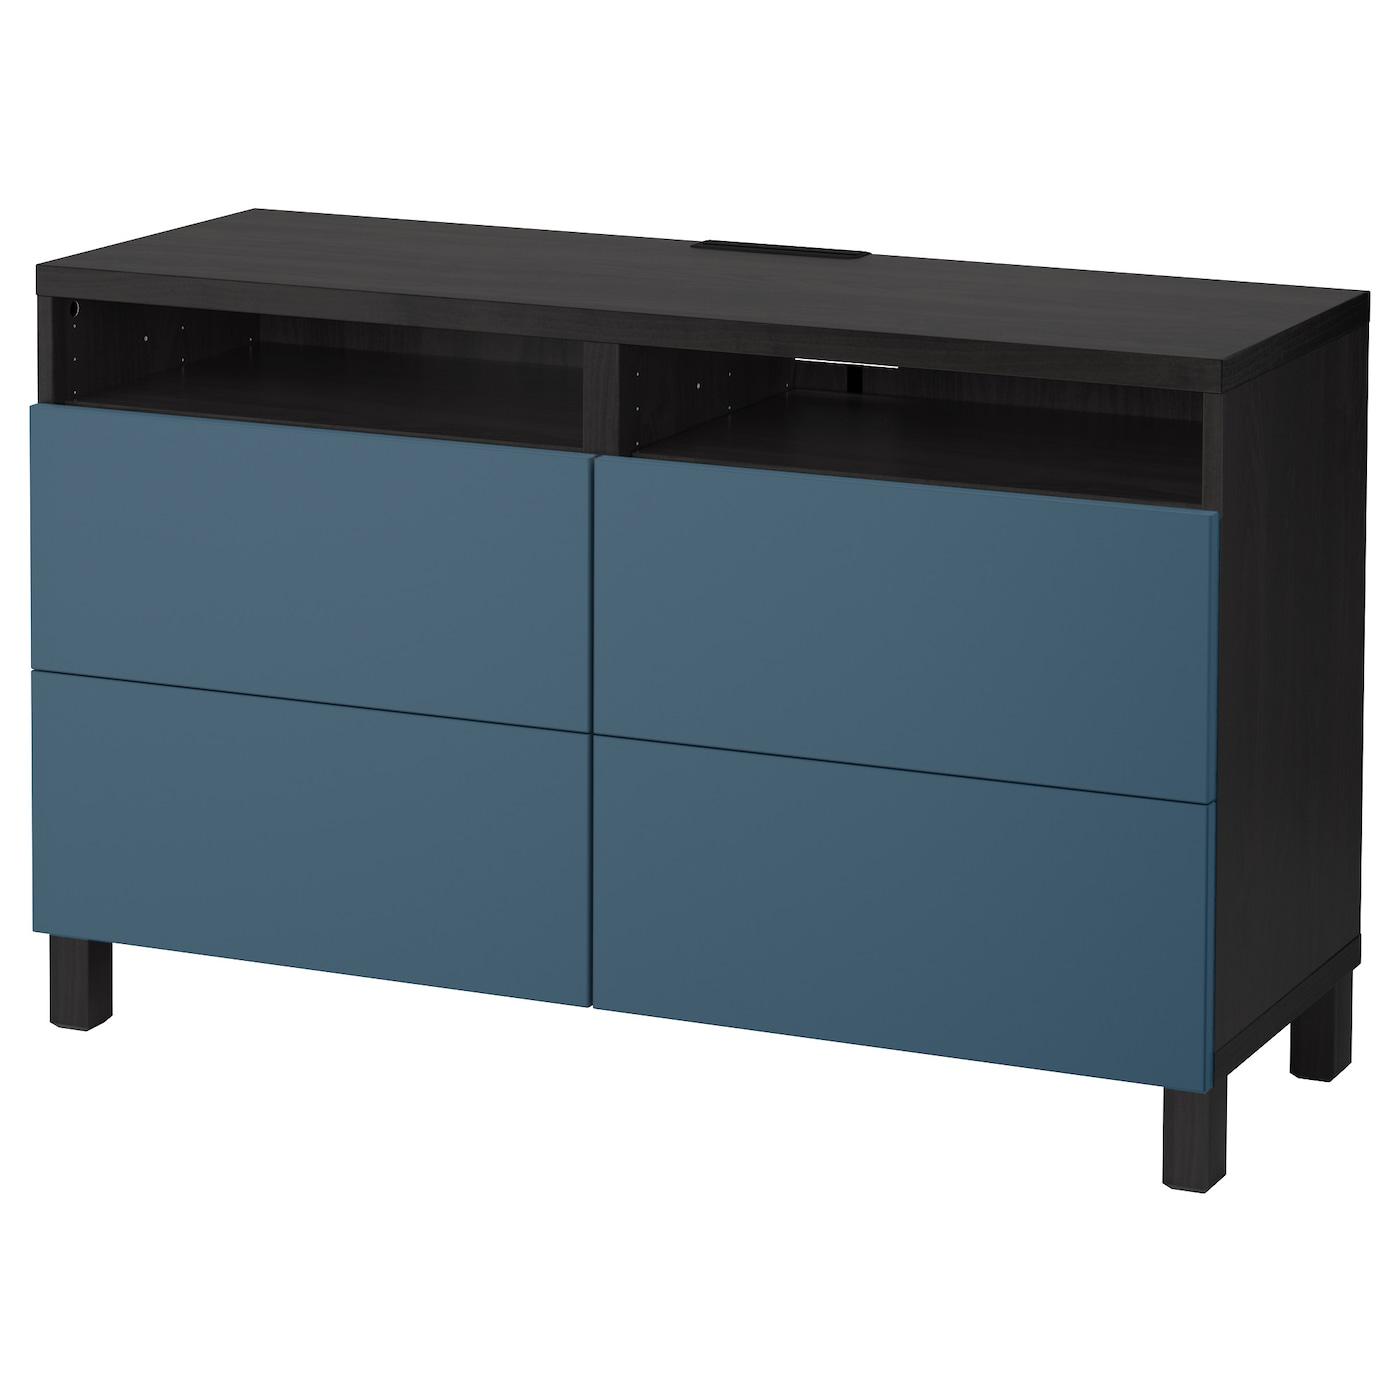 Tv Kast Ikea Lack.Tv Meubel Besta Ikea Ikea Best Tv Meubel Met Lades Ikea Lack Tv